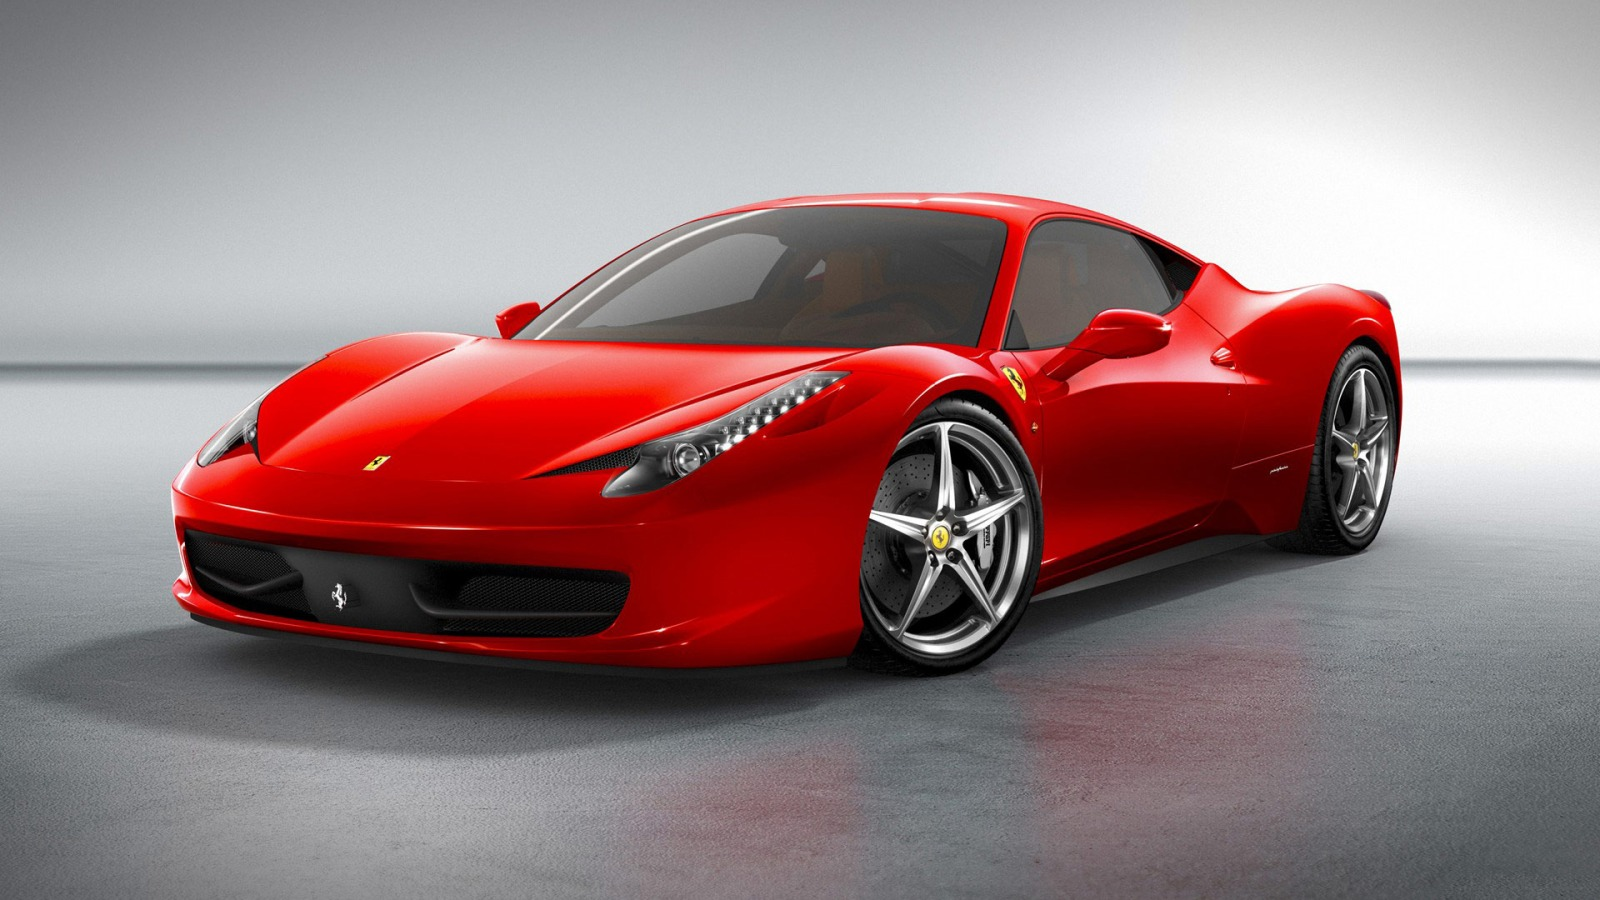 Ferrari Italia Wallpaper Ferrari Cars Wallpapers In Jpg Format